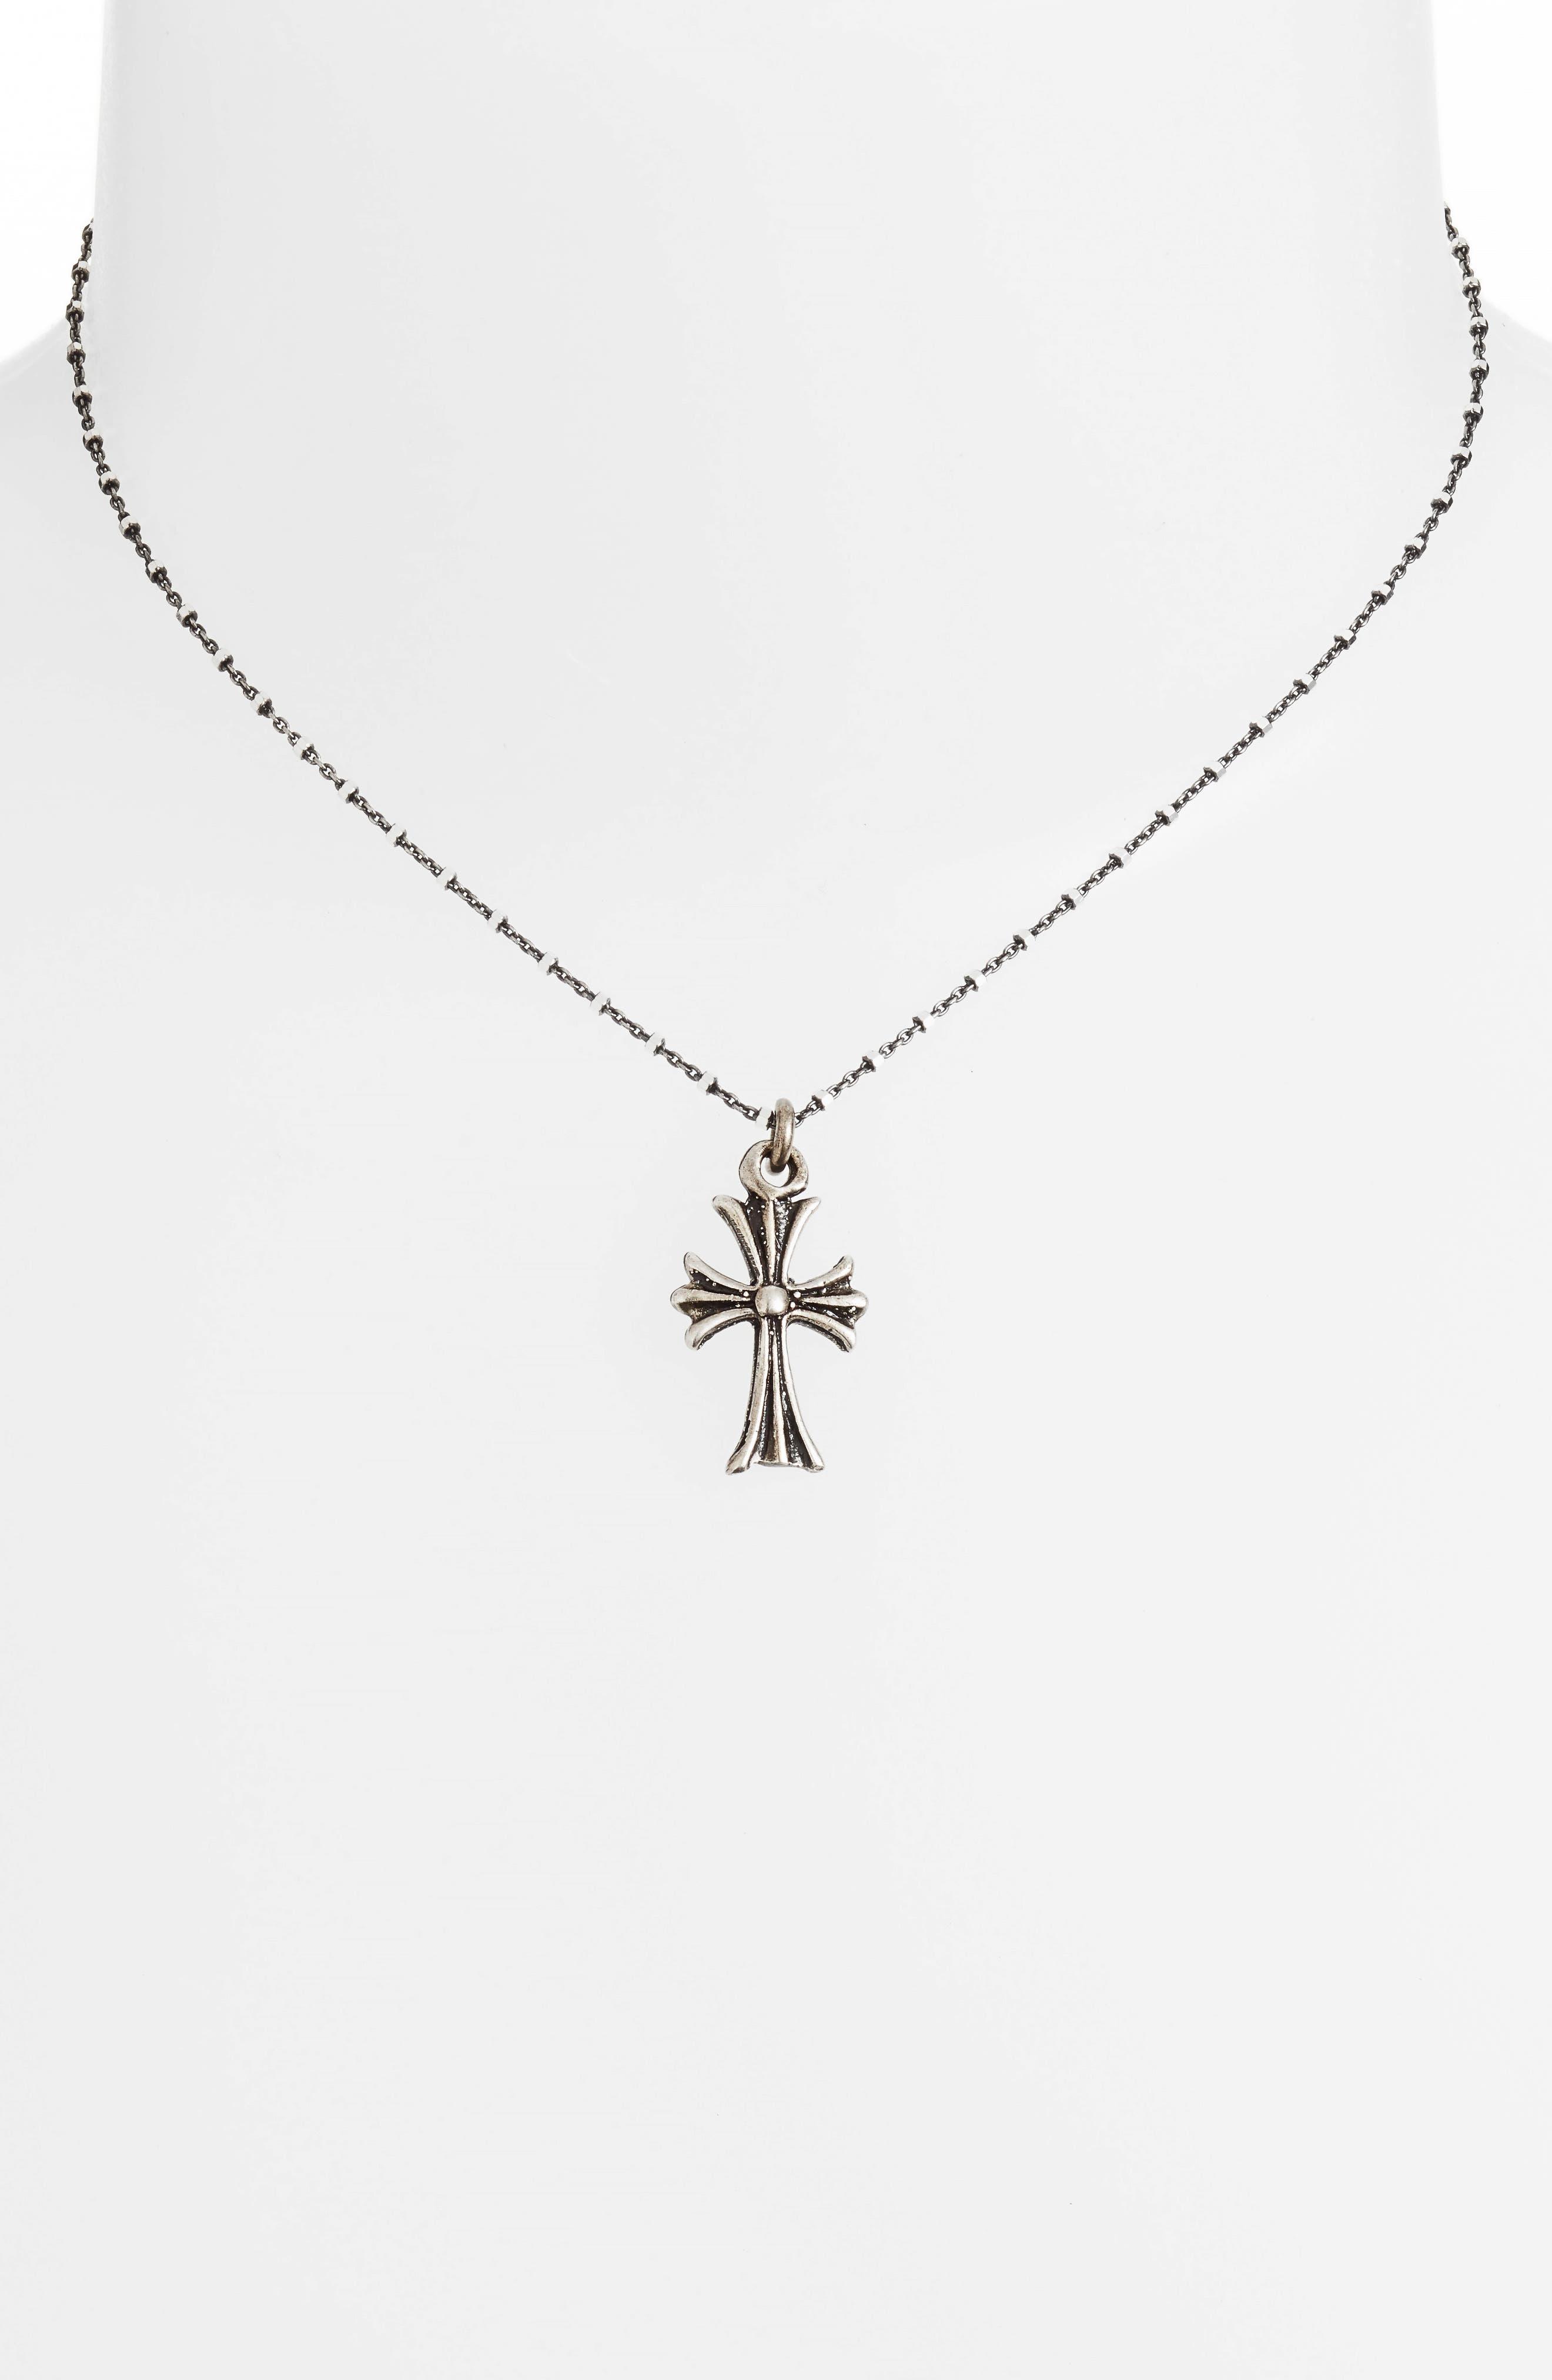 Engraved Pendant Necklace,                             Alternate thumbnail 2, color,                             Silver